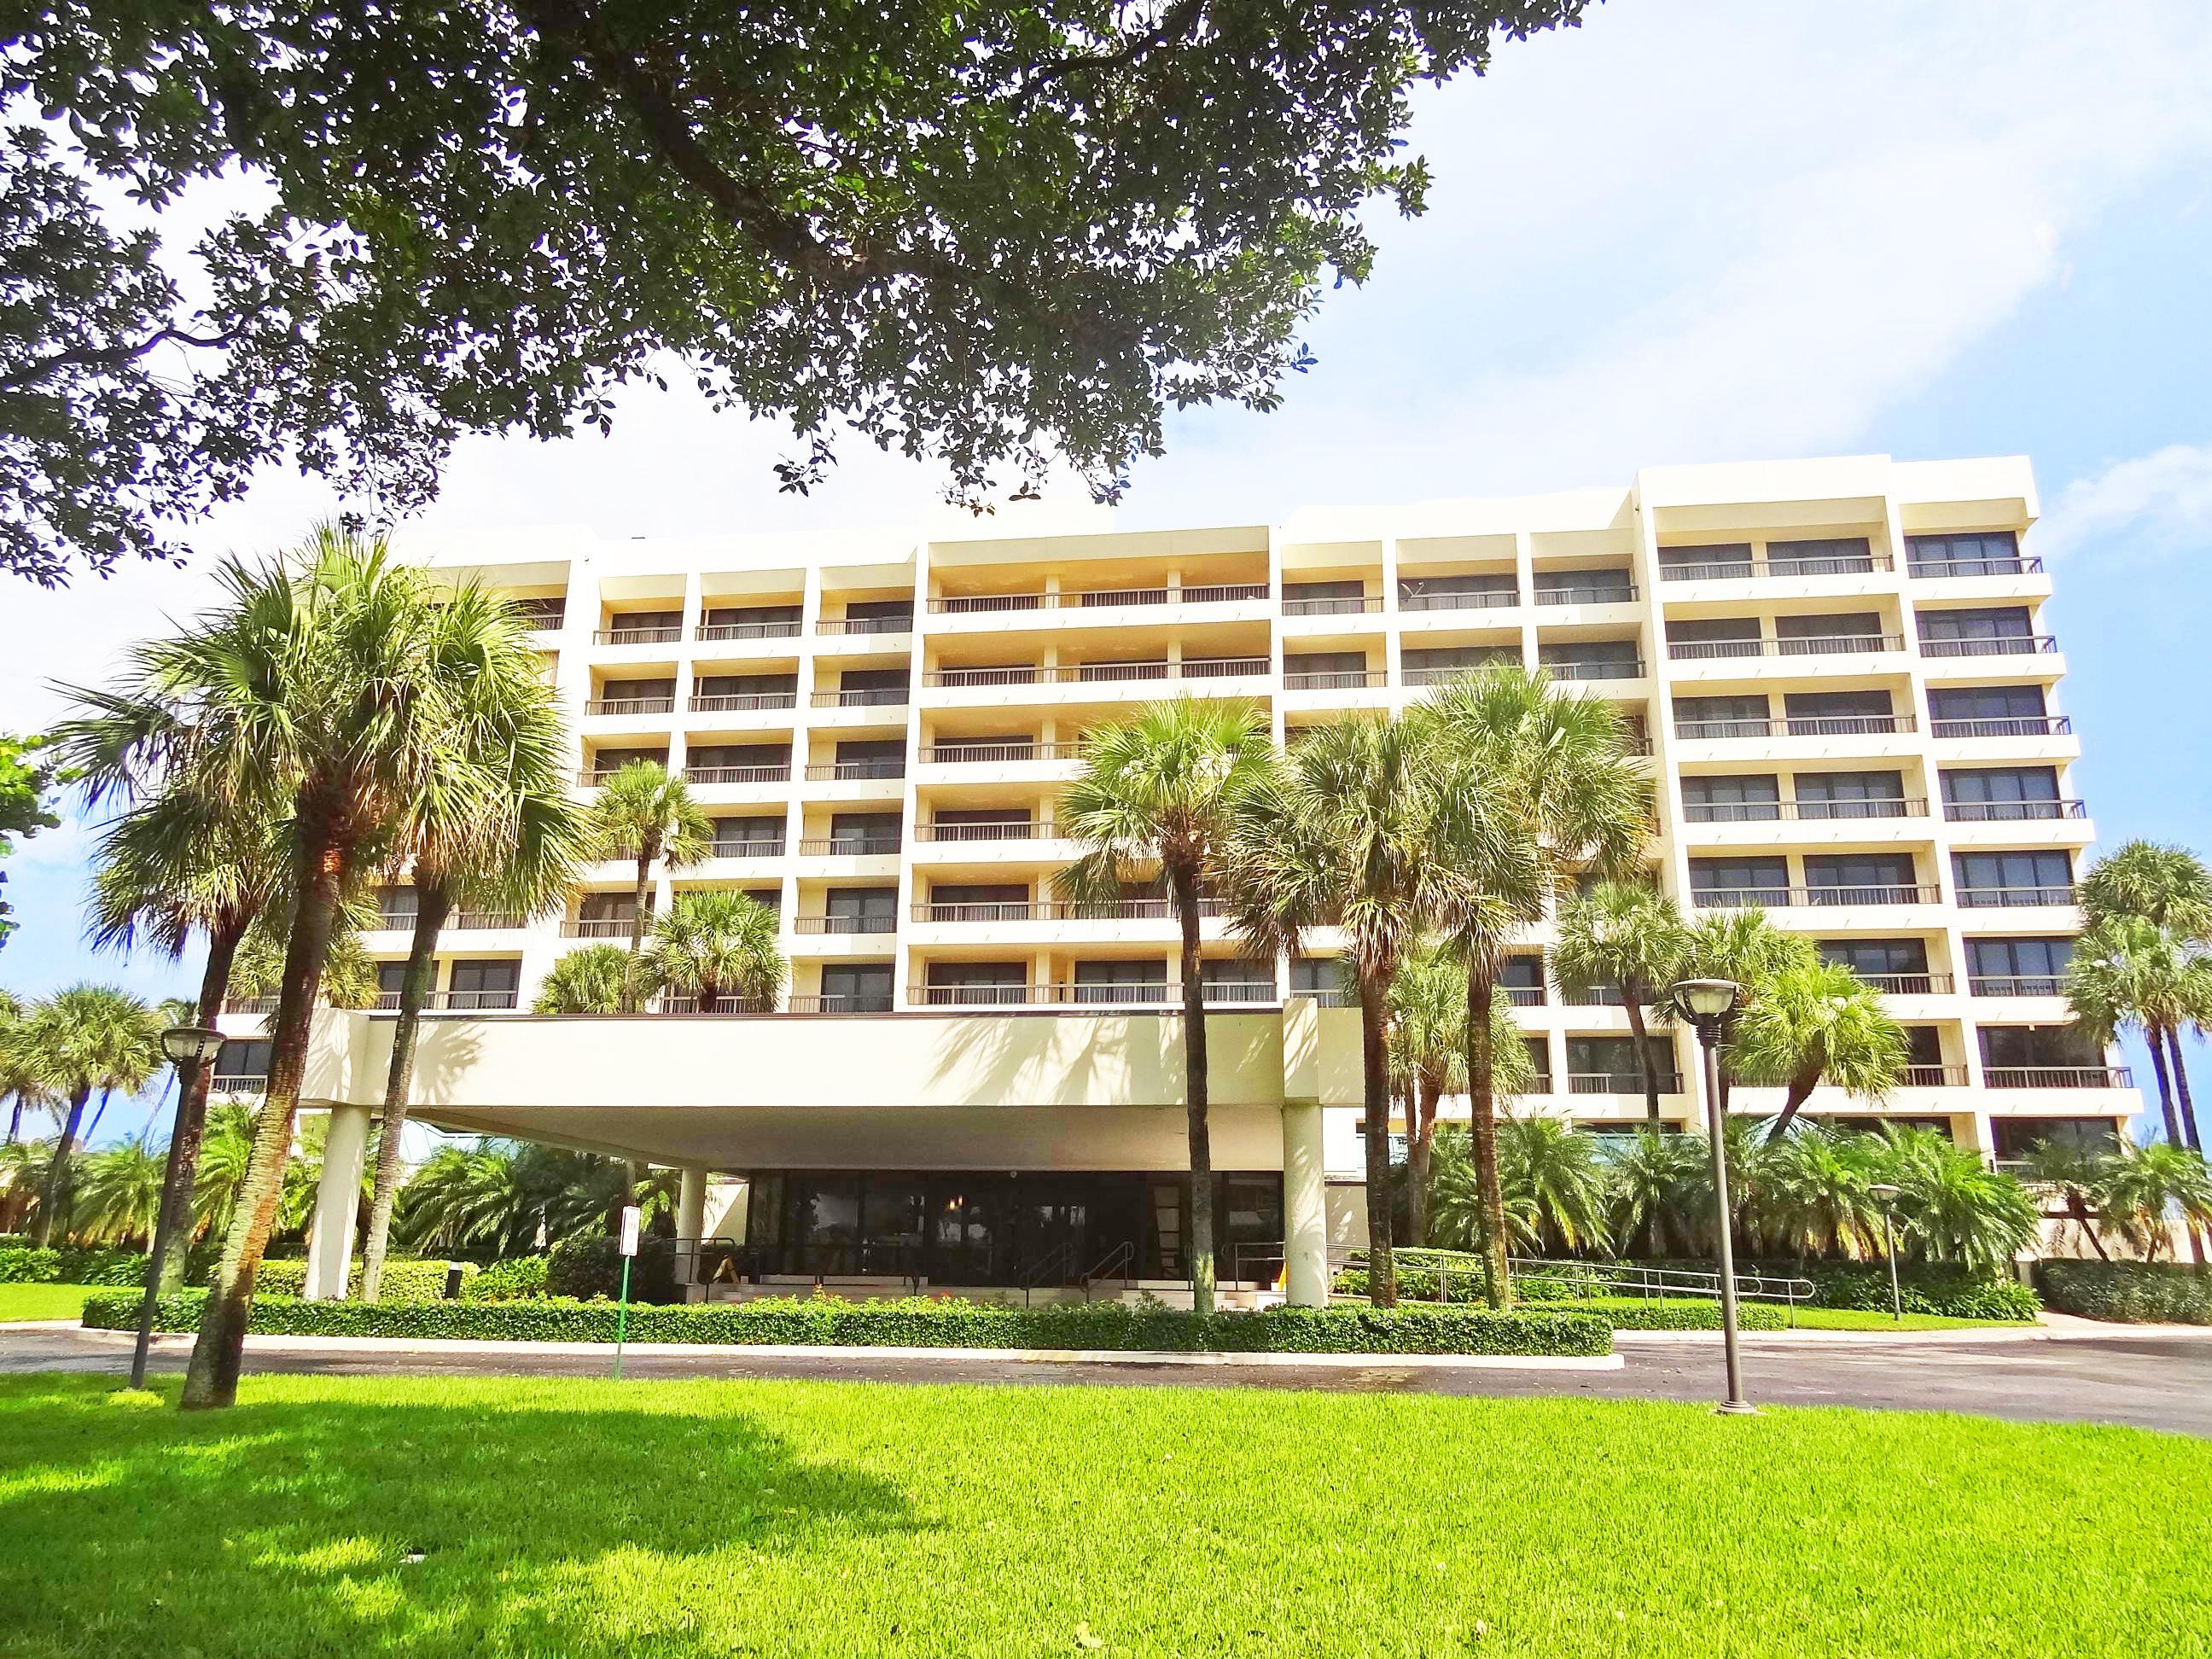 Photo of 1800 S Ocean Boulevard #4 B, Boca Raton, FL 33432